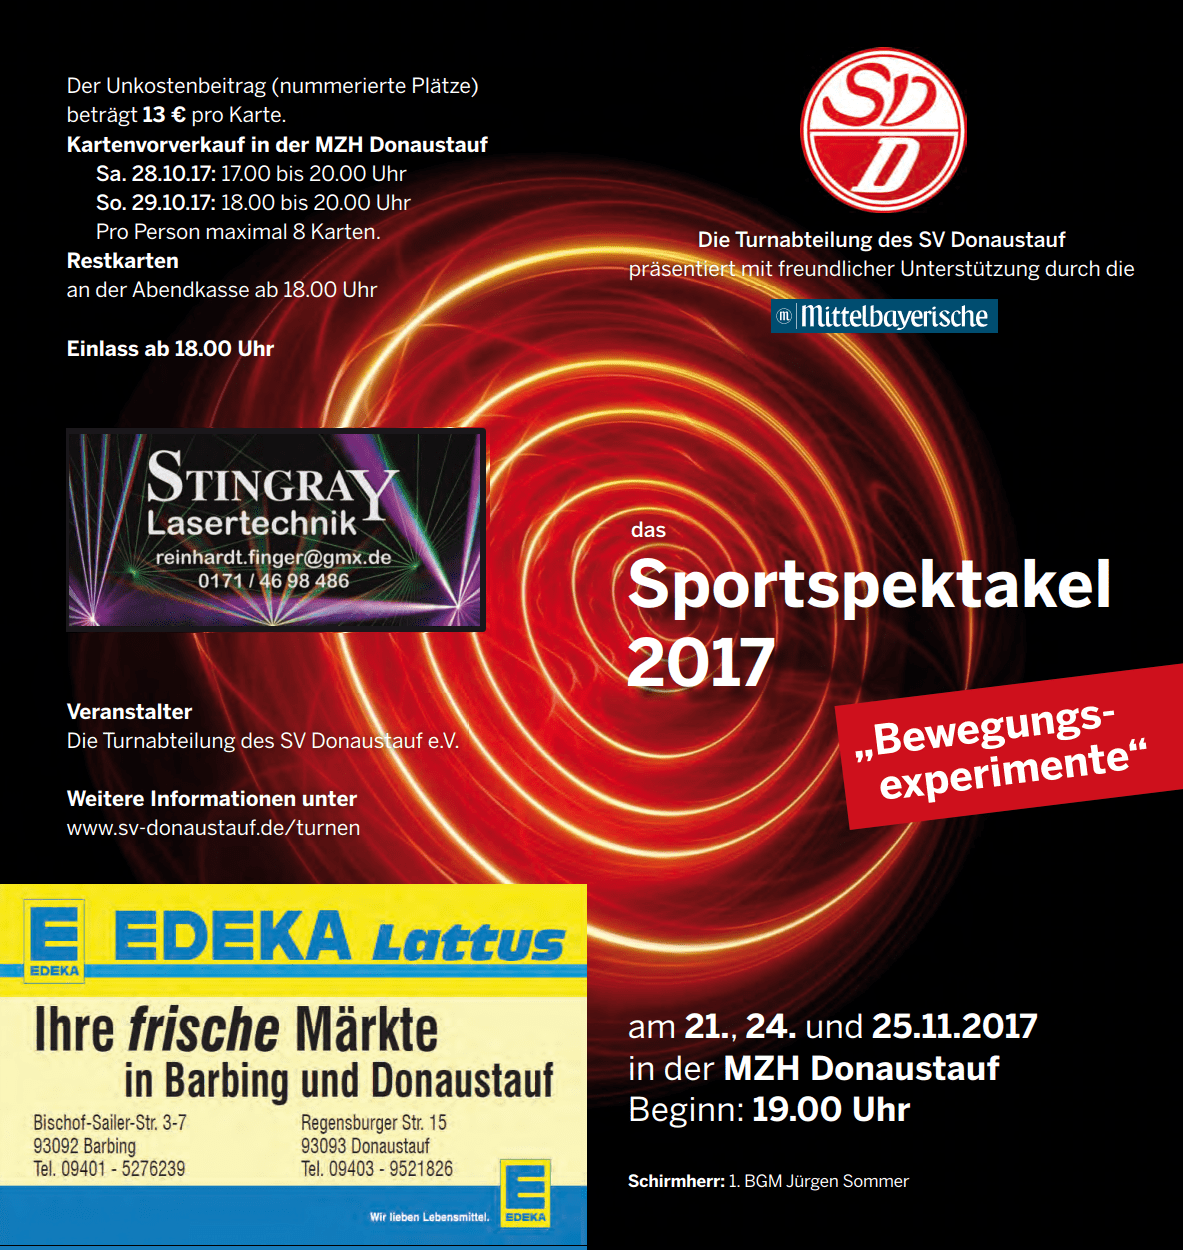 Flyer_Sportspektakel_Donaustauf_2017_FA_1